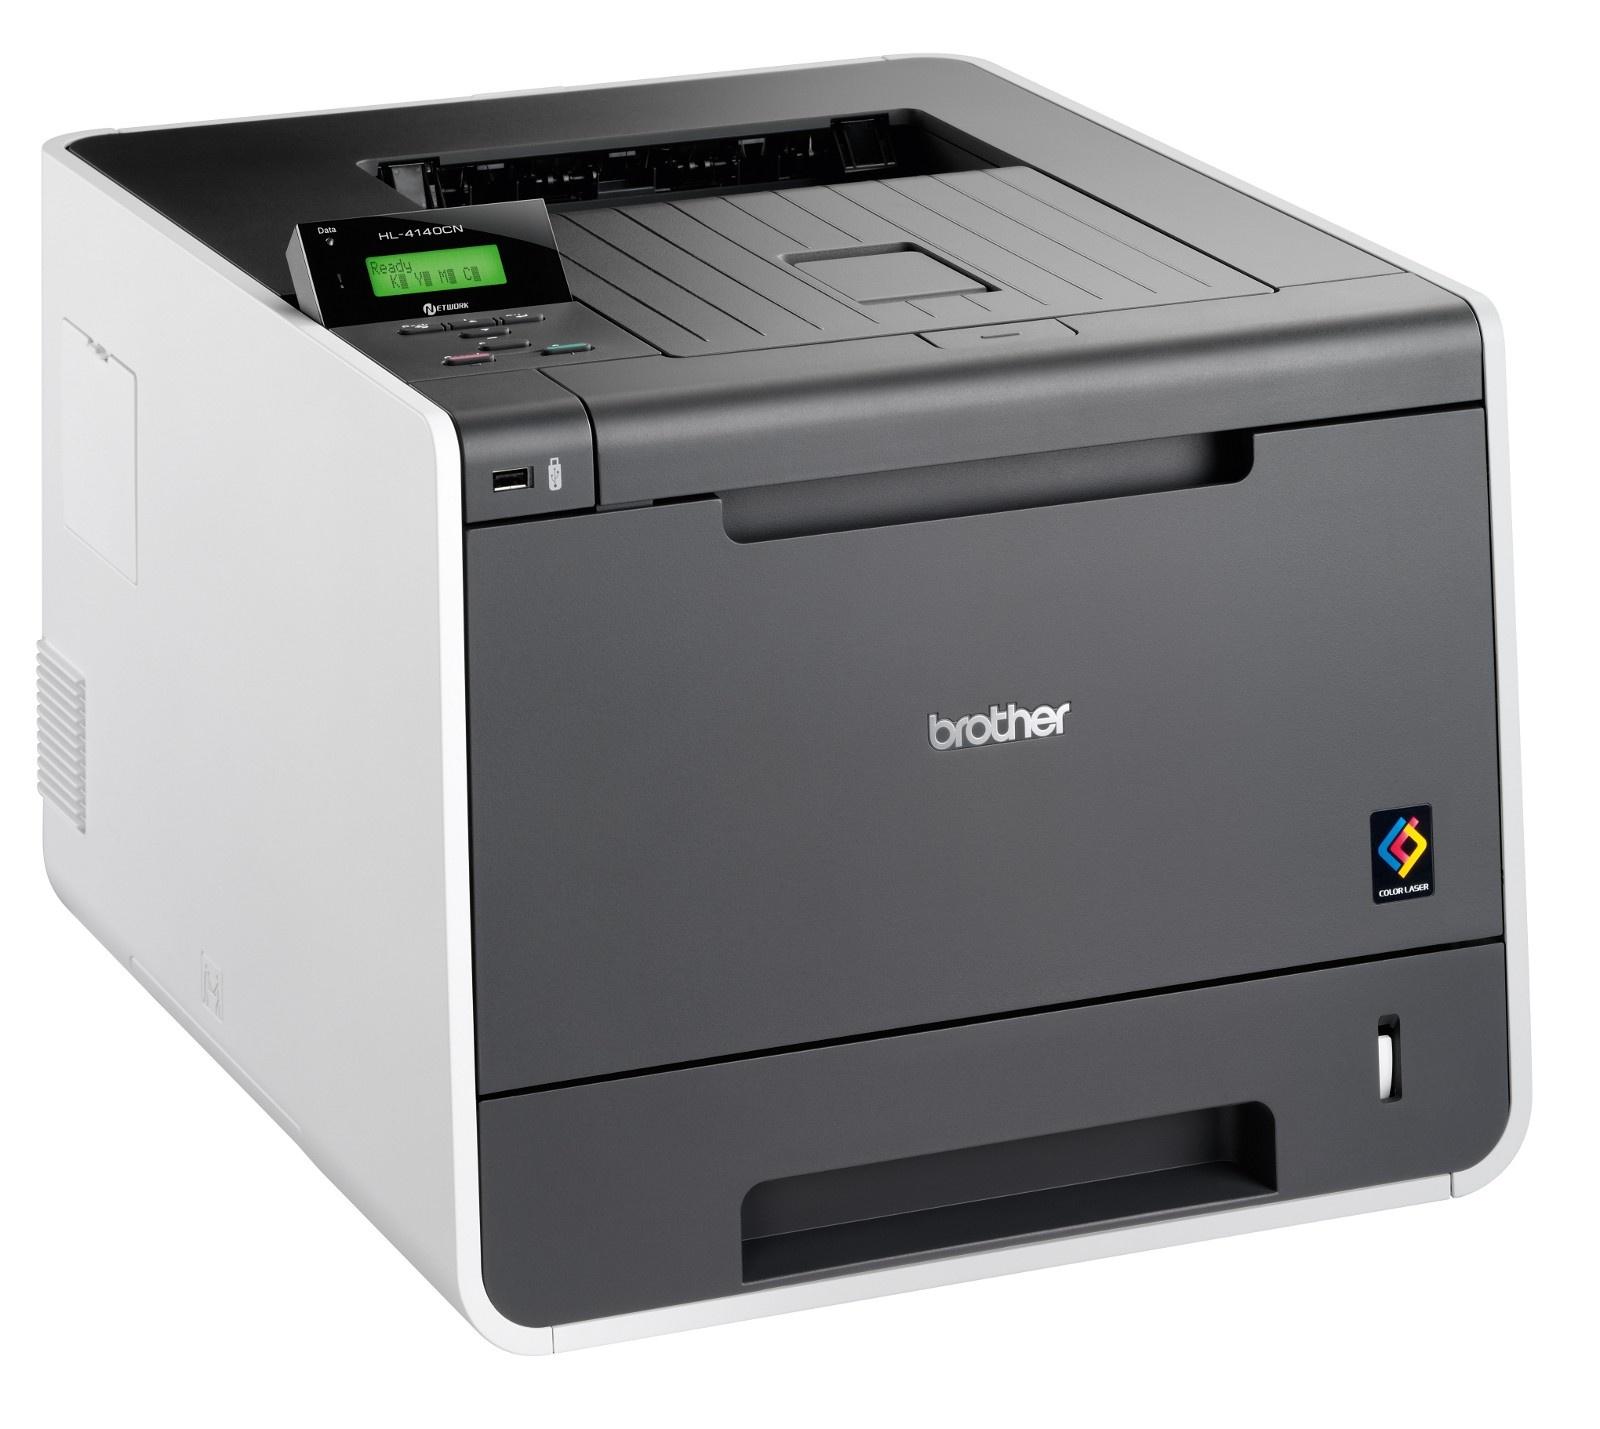 Hp 4140 printer